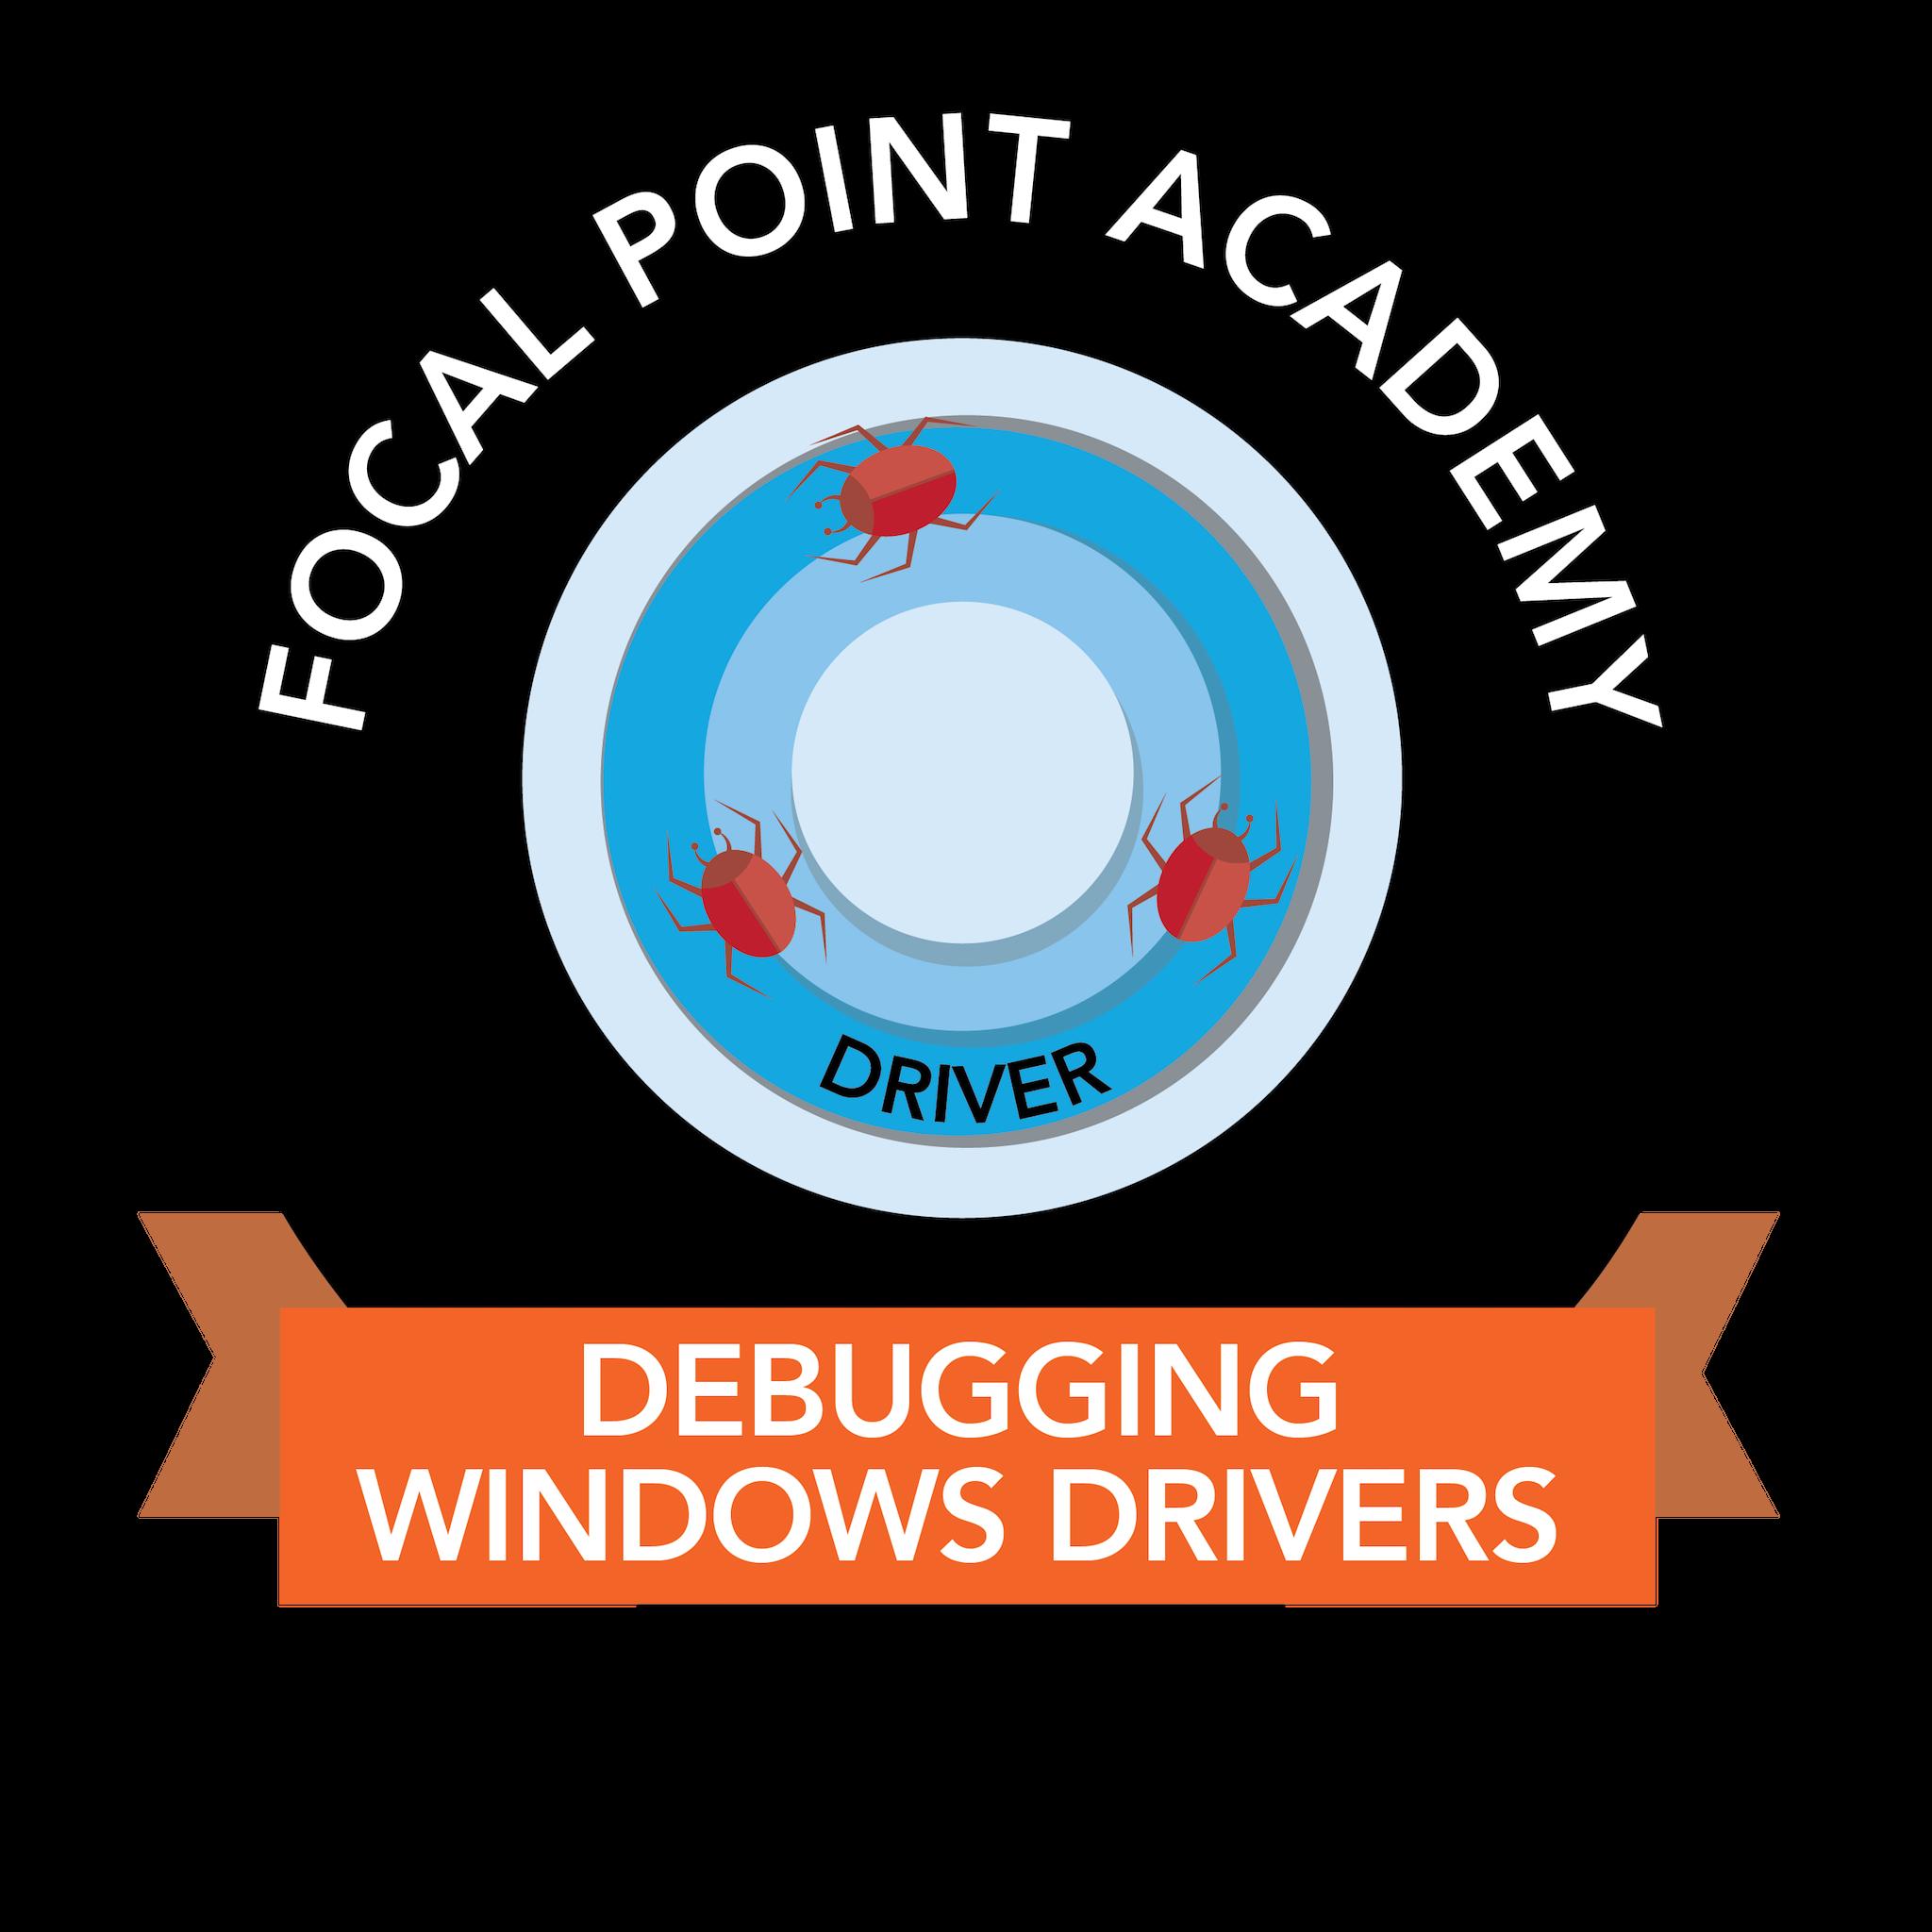 Debugging Windows Drivers